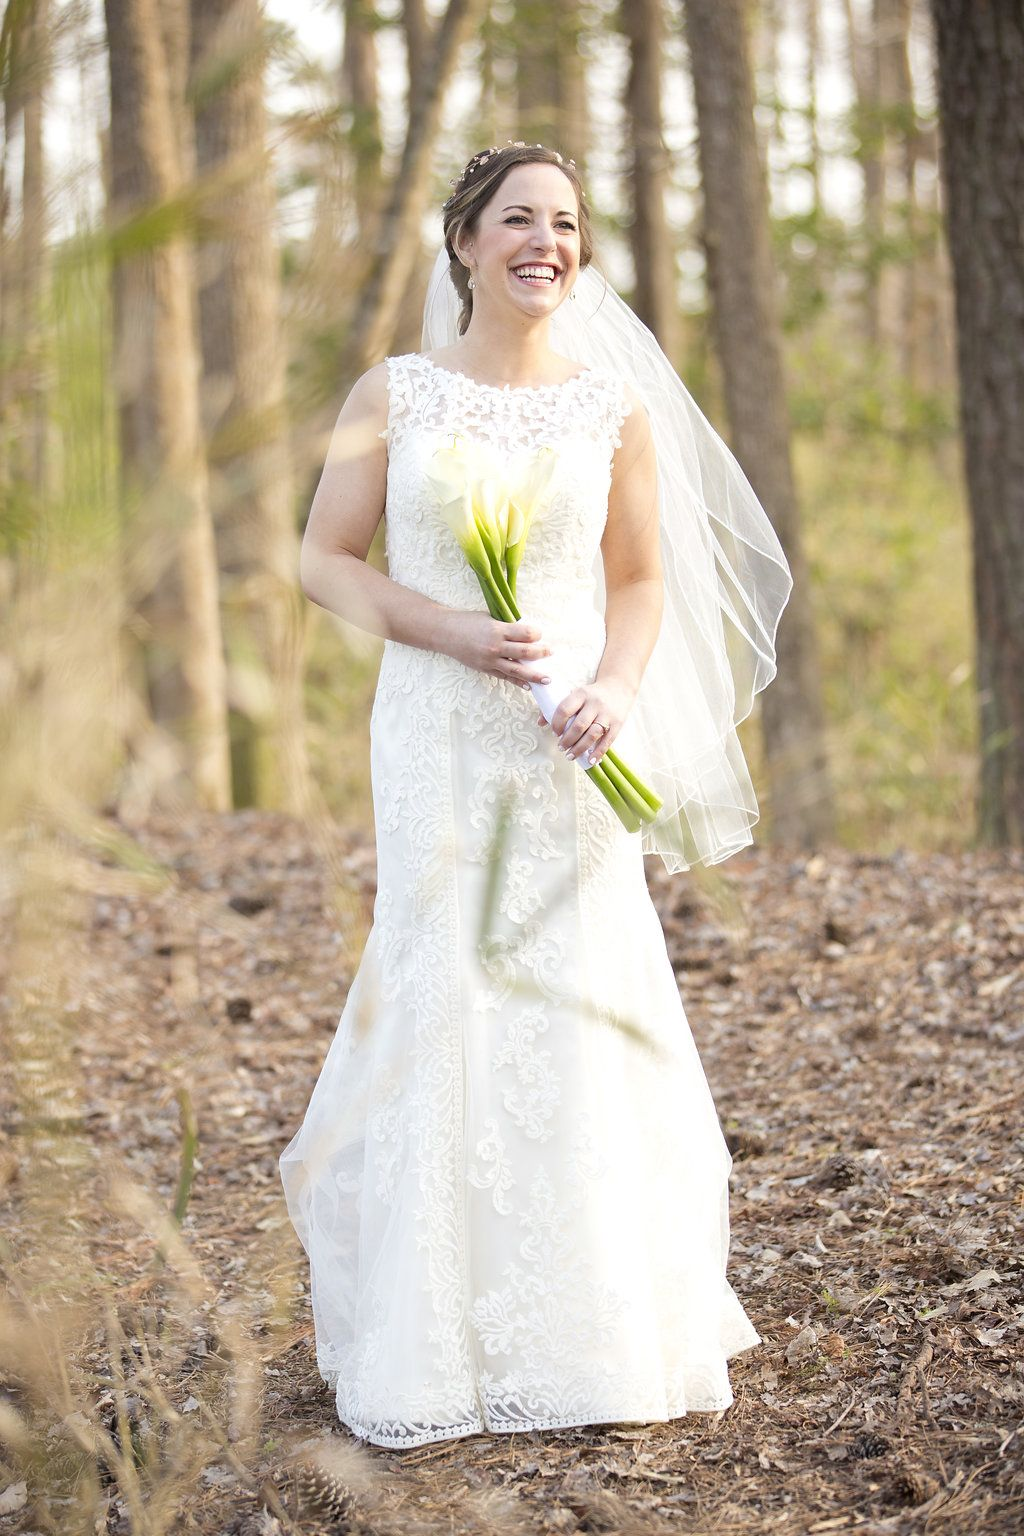 Mother of the groom dresses afternoon wedding  Kelly  Bridal Portrait  Washington NC  CL Brides  Pinterest